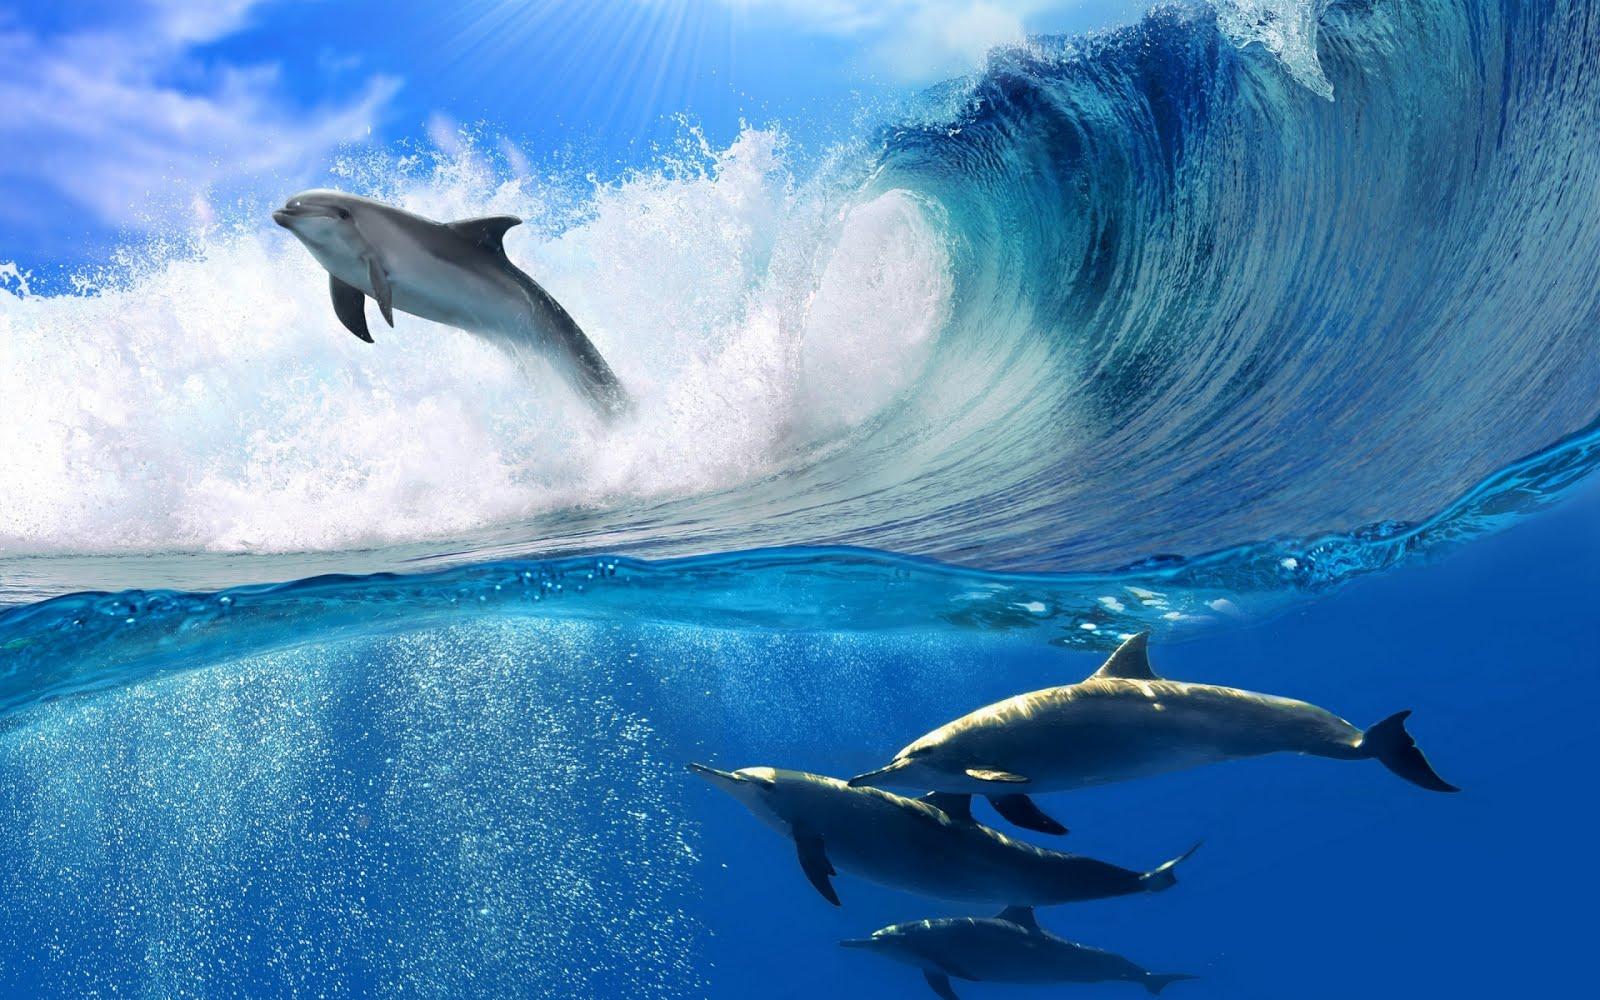 http://3.bp.blogspot.com/-WT_oTbfPTo4/UKLzRlj82DI/AAAAAAABQHI/hs0fUsvMKv0/s1600/delfines-nadando-en-el-mar-dolphins-swimming-1920x1200-wallpaper.jpg